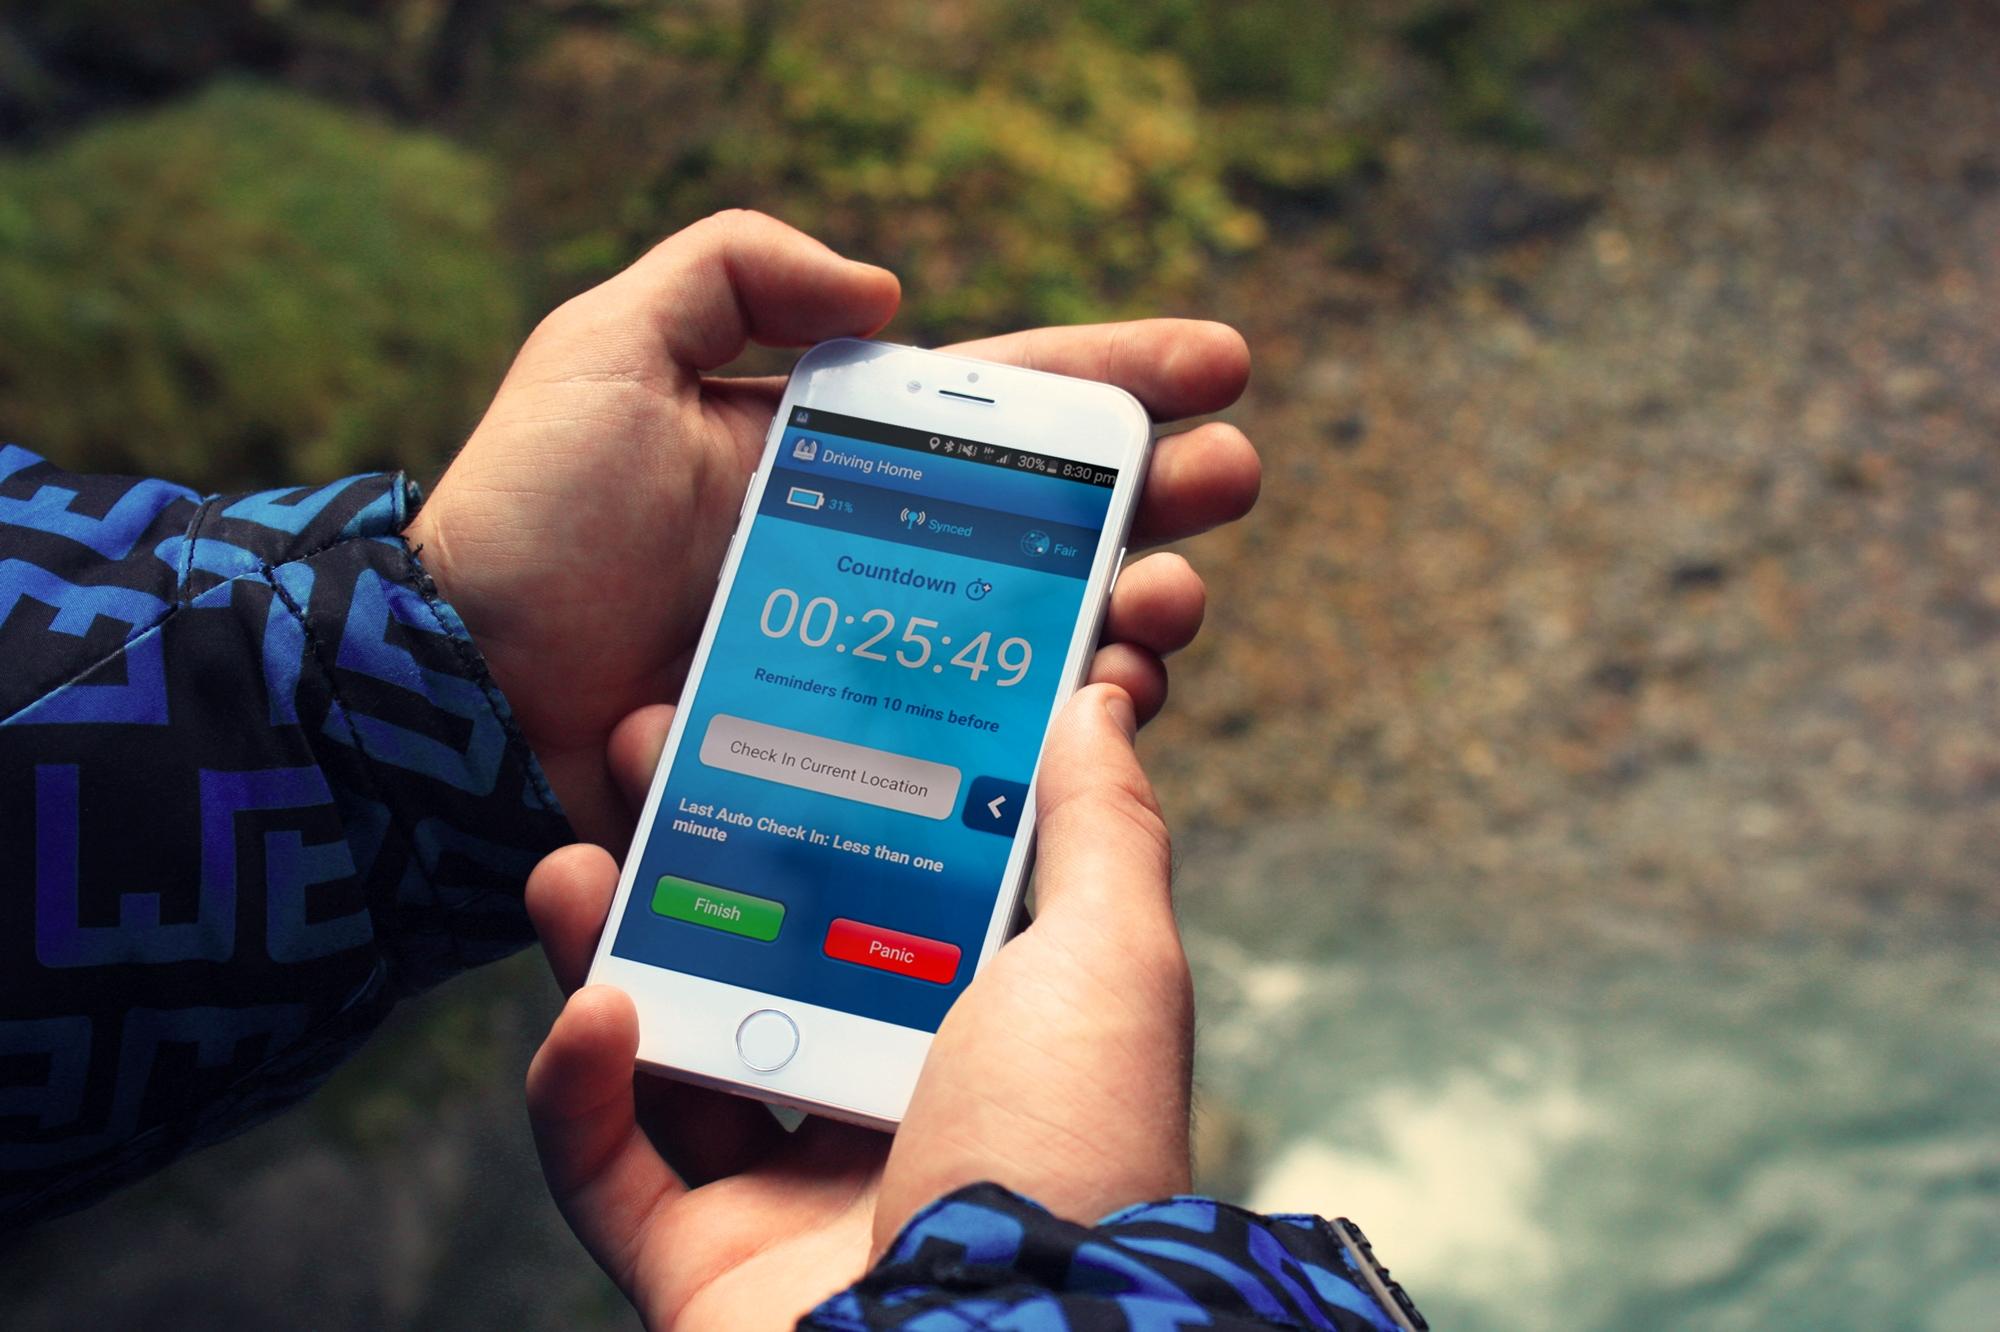 Get Home Safe App on iPhone